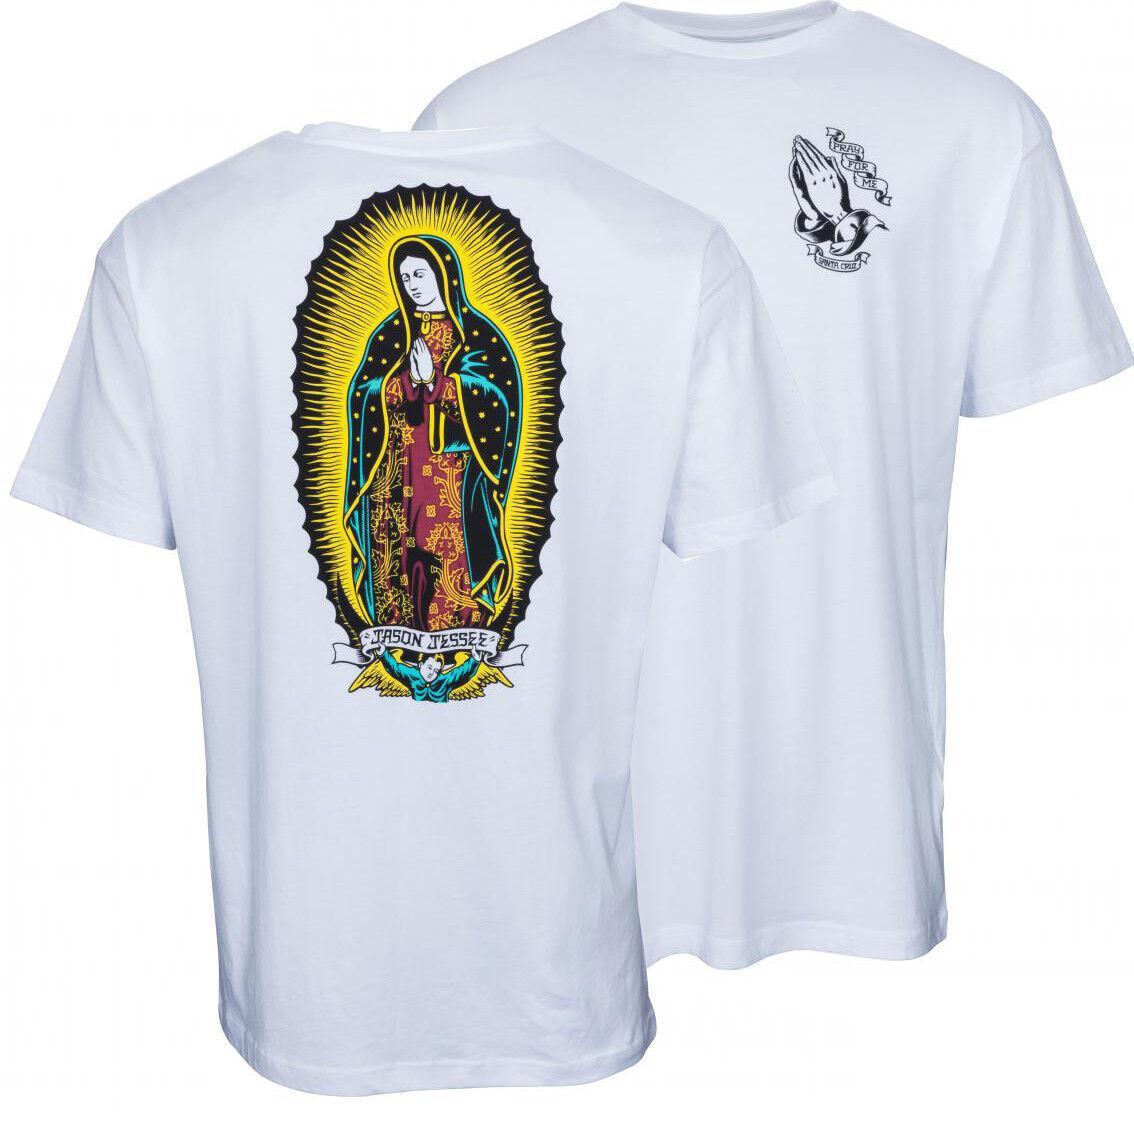 Santa Cruz Jason Jessee Guadalupe- Skateboard T-Shirt - '80s Klassisch Klassisch '80s f704f9